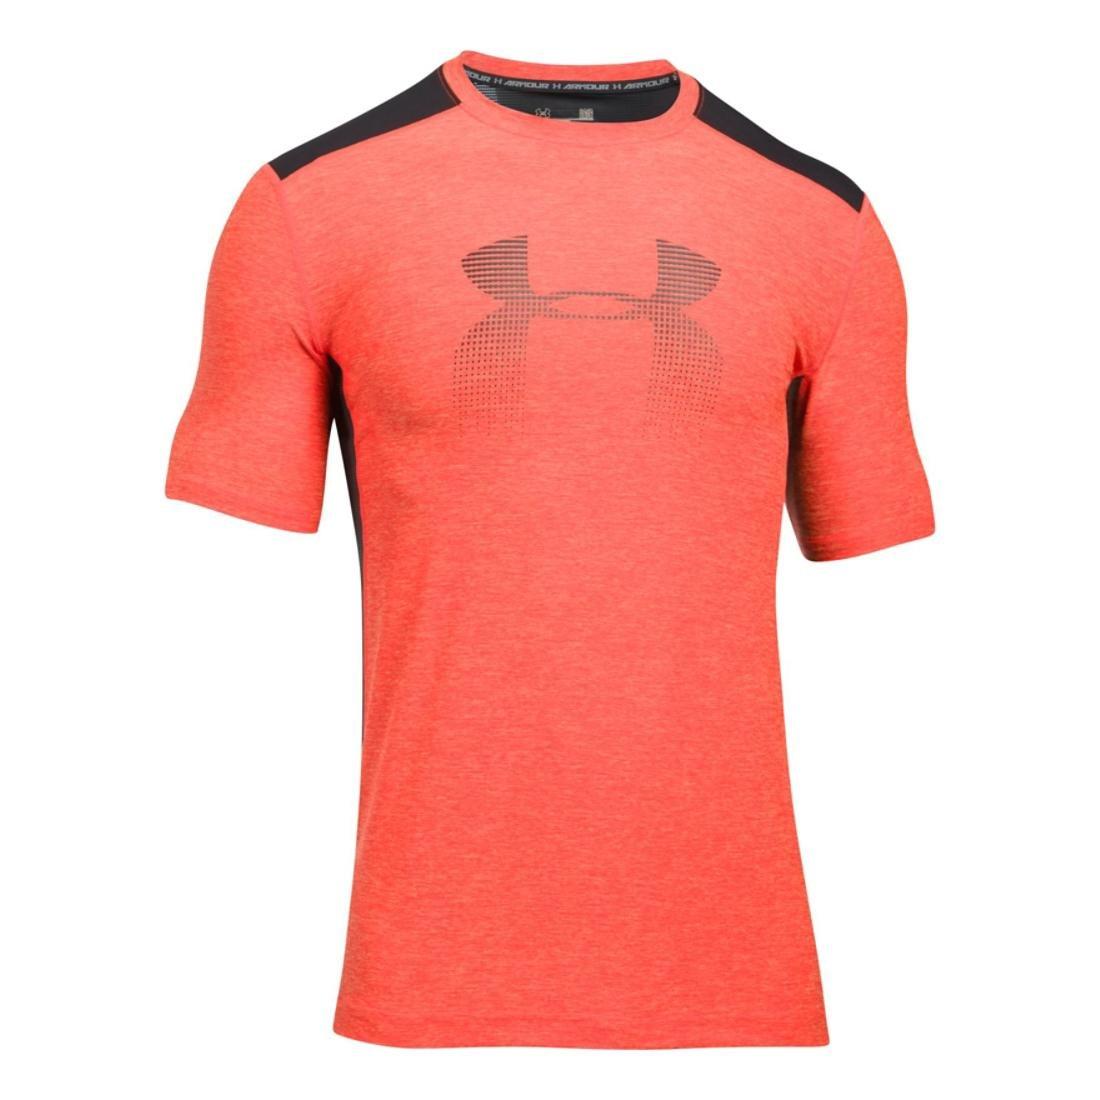 Under Armour Herren Raid Graphic Short Sleeve Shirt: Amazon.de: Bekleidung